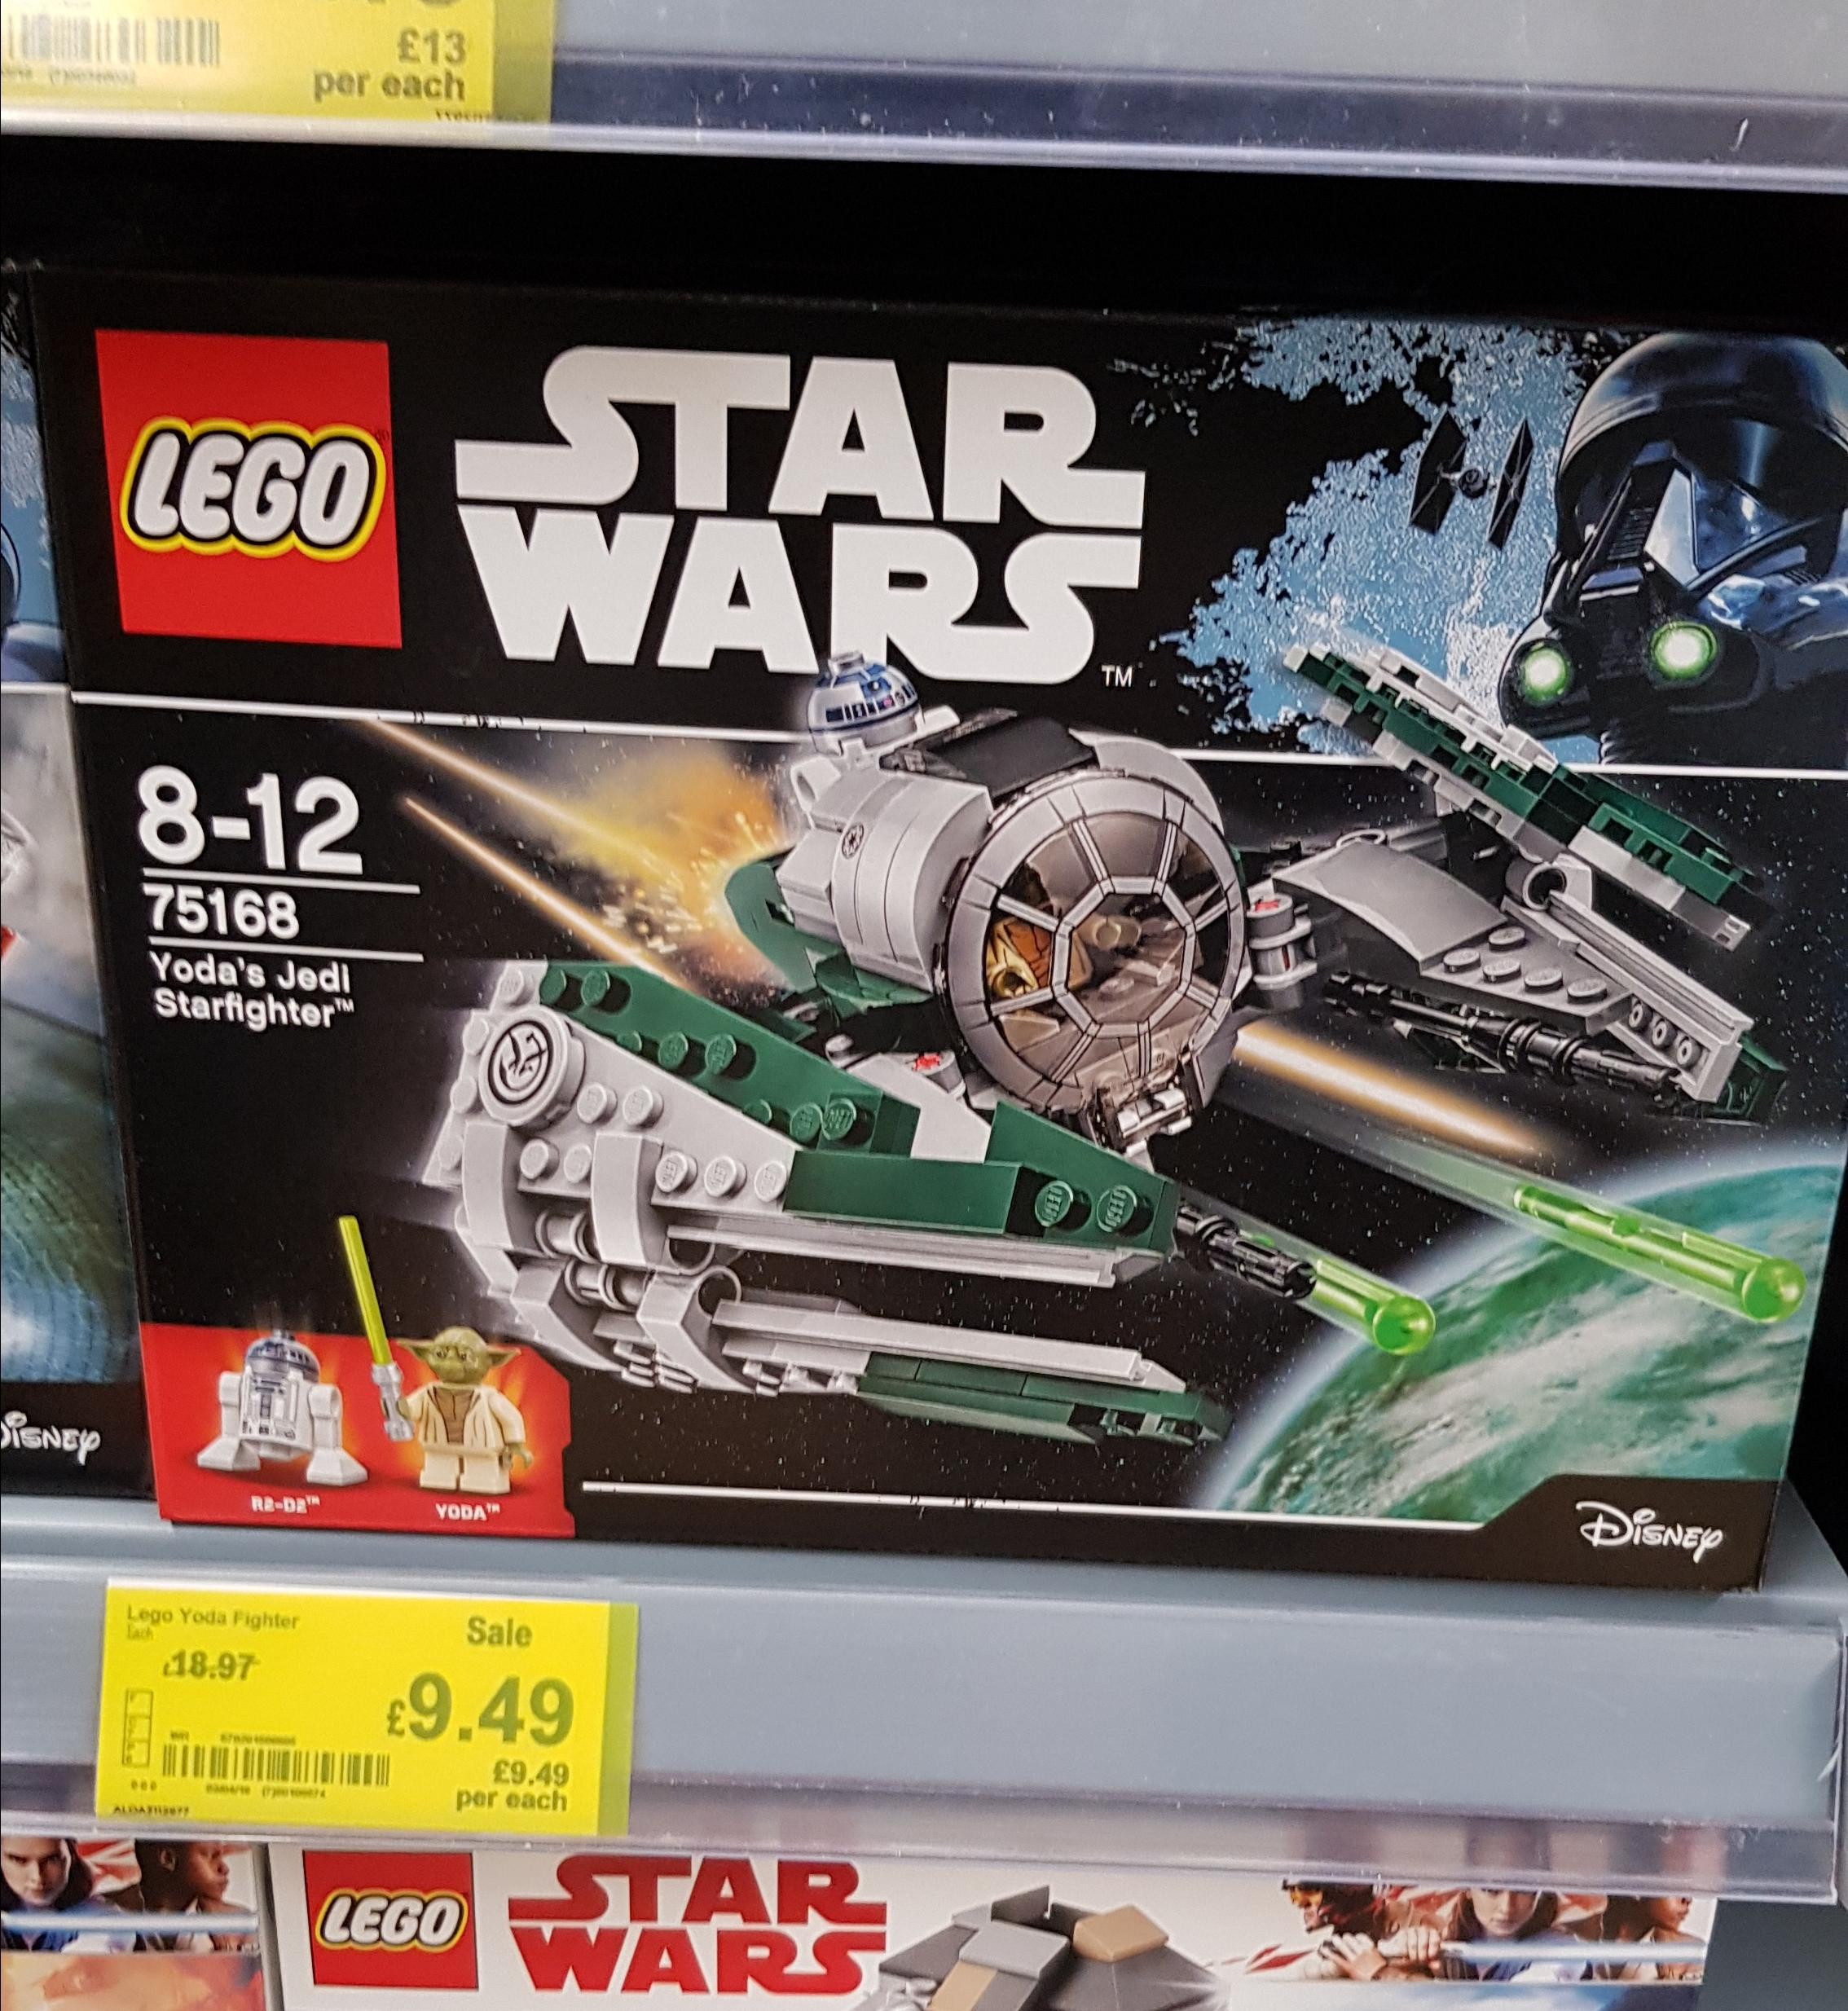 LEGO 75168 Star Wars Yoda's Jedi Starfighter - £9.49 @ Asda (instore)